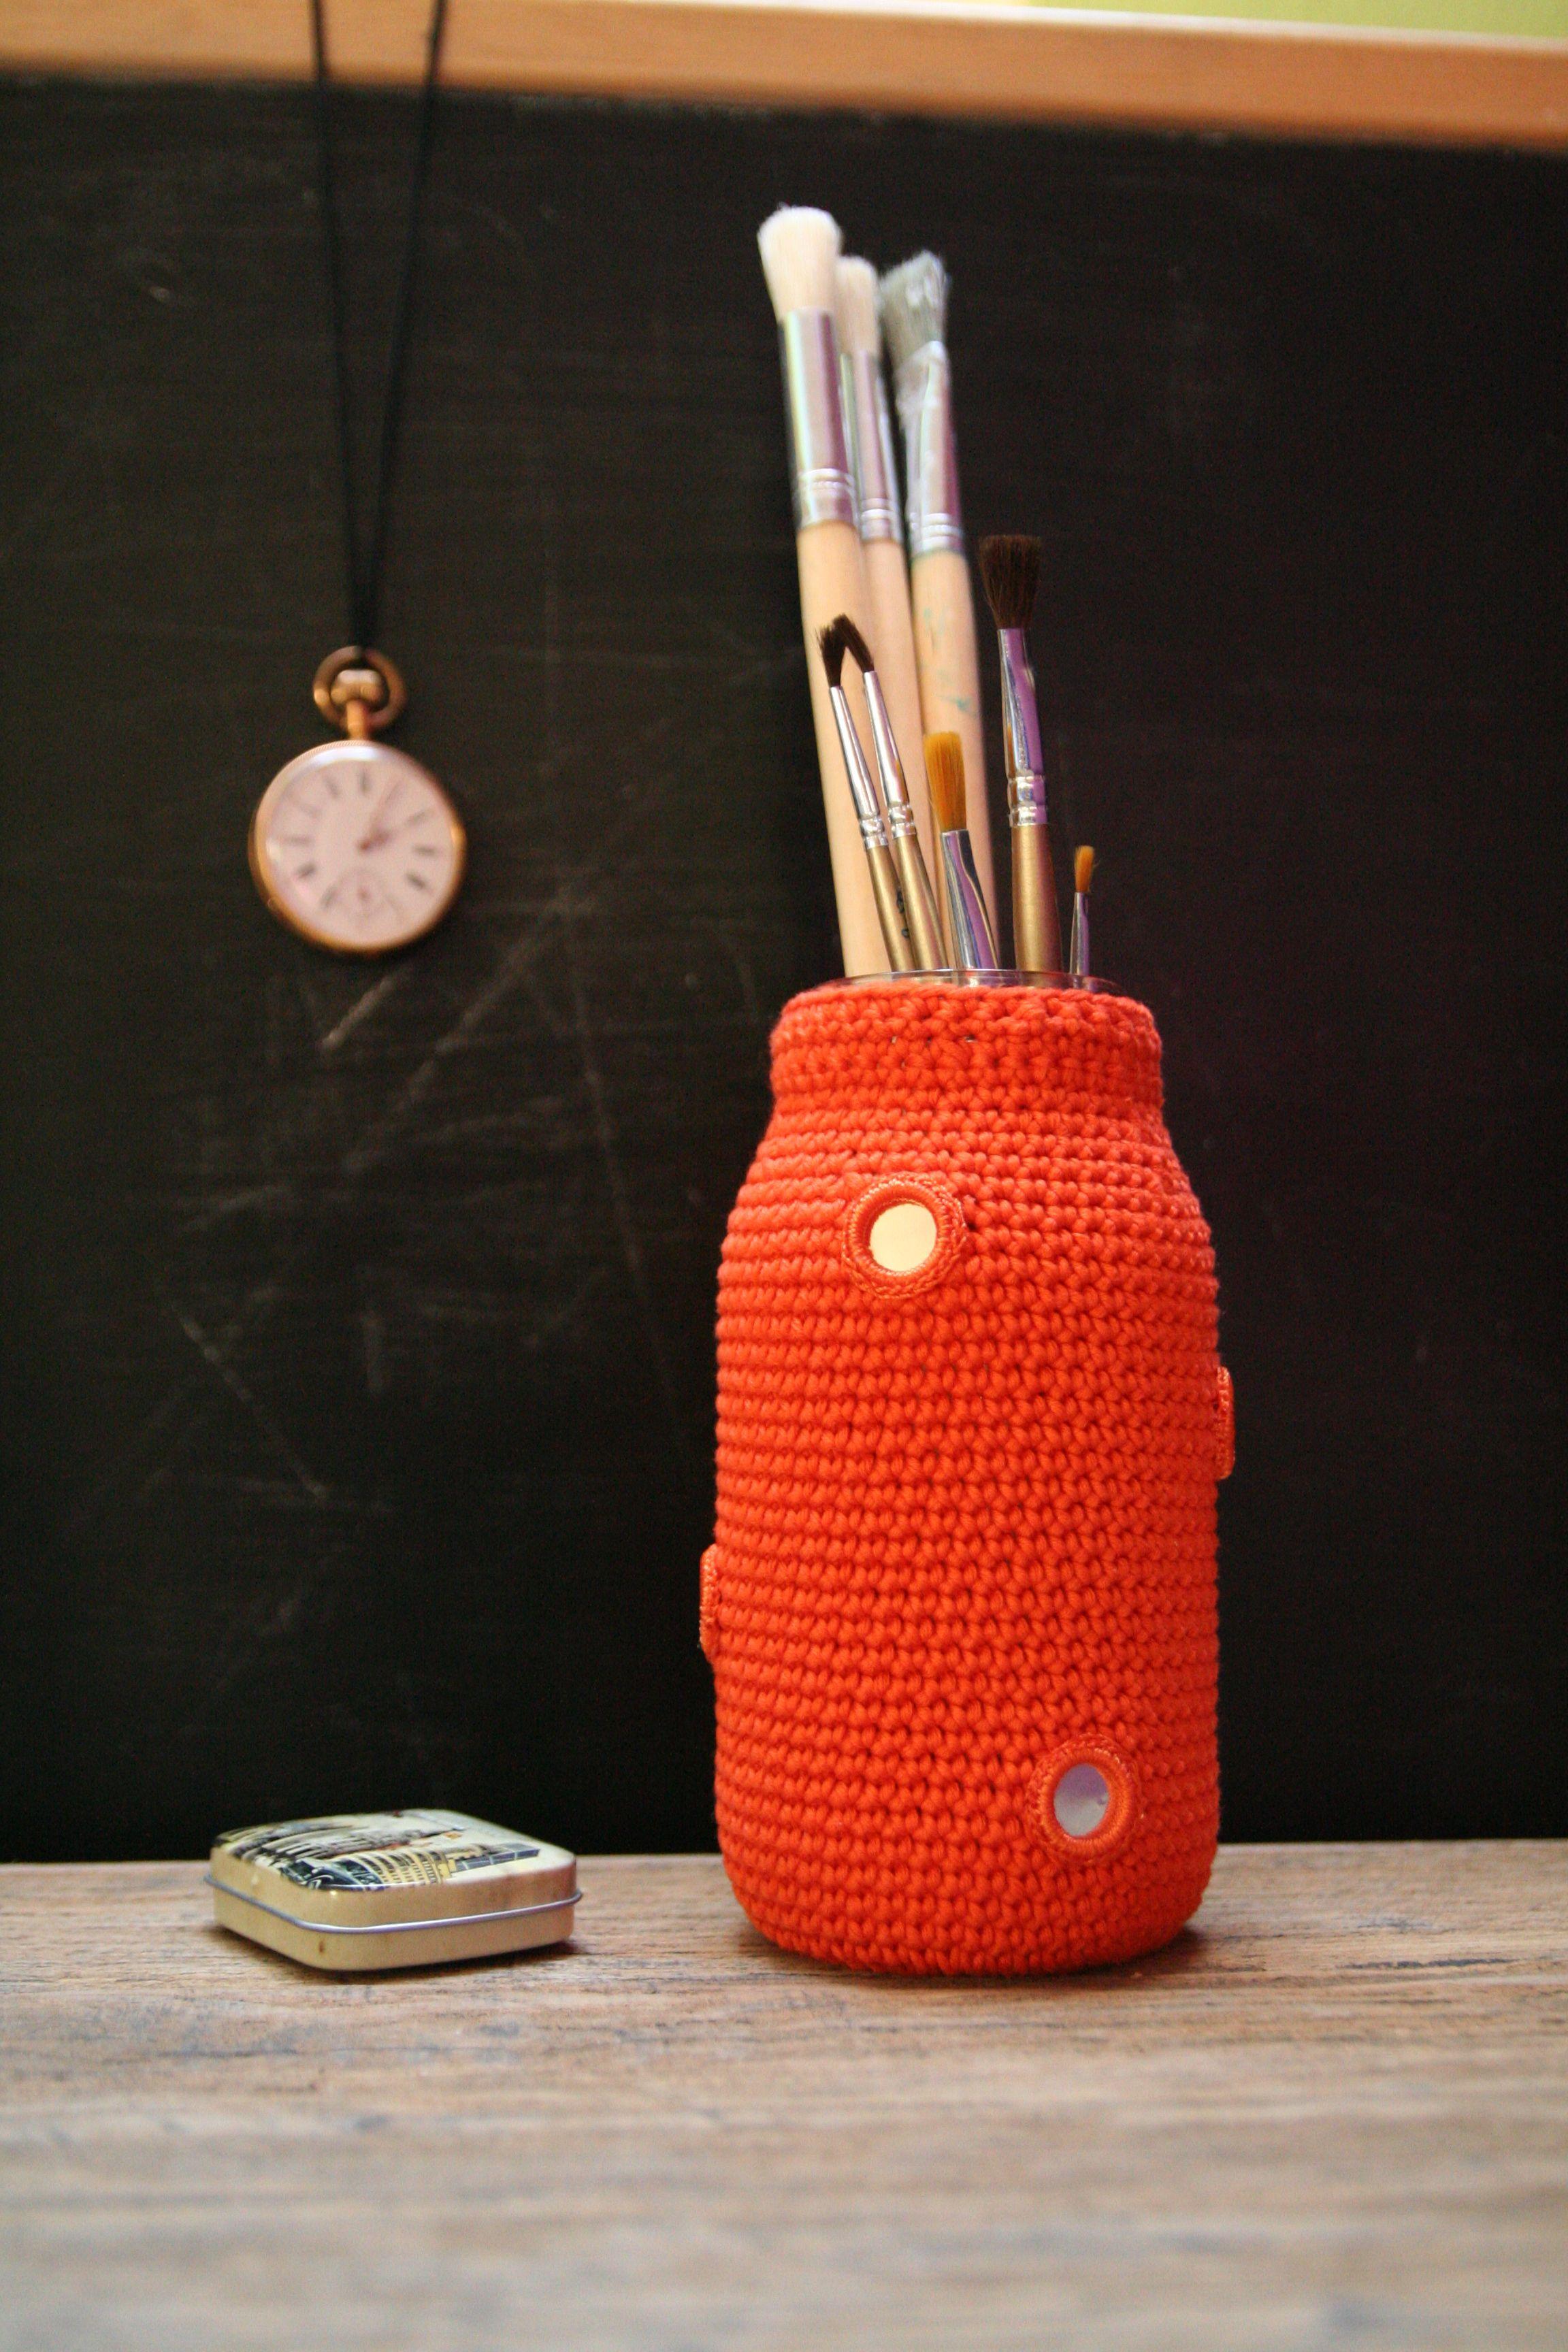 So Hilti colourful vase...